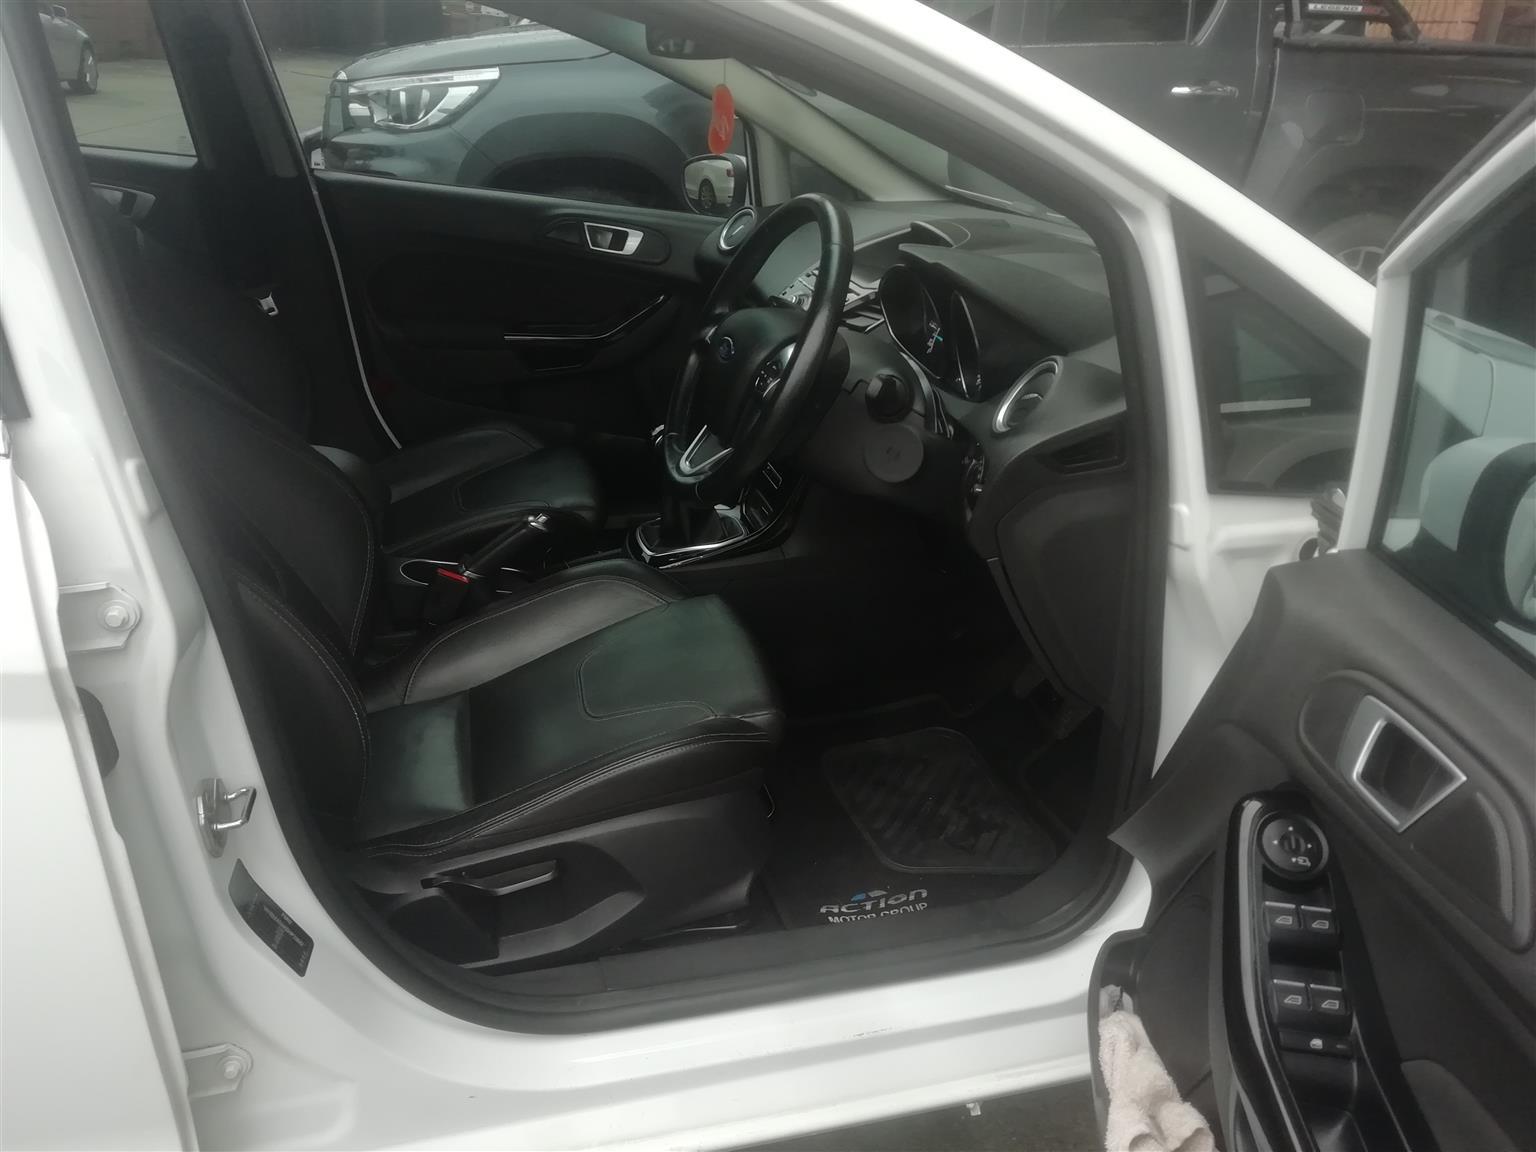 Ford Fiesta 2018 Ecoboost